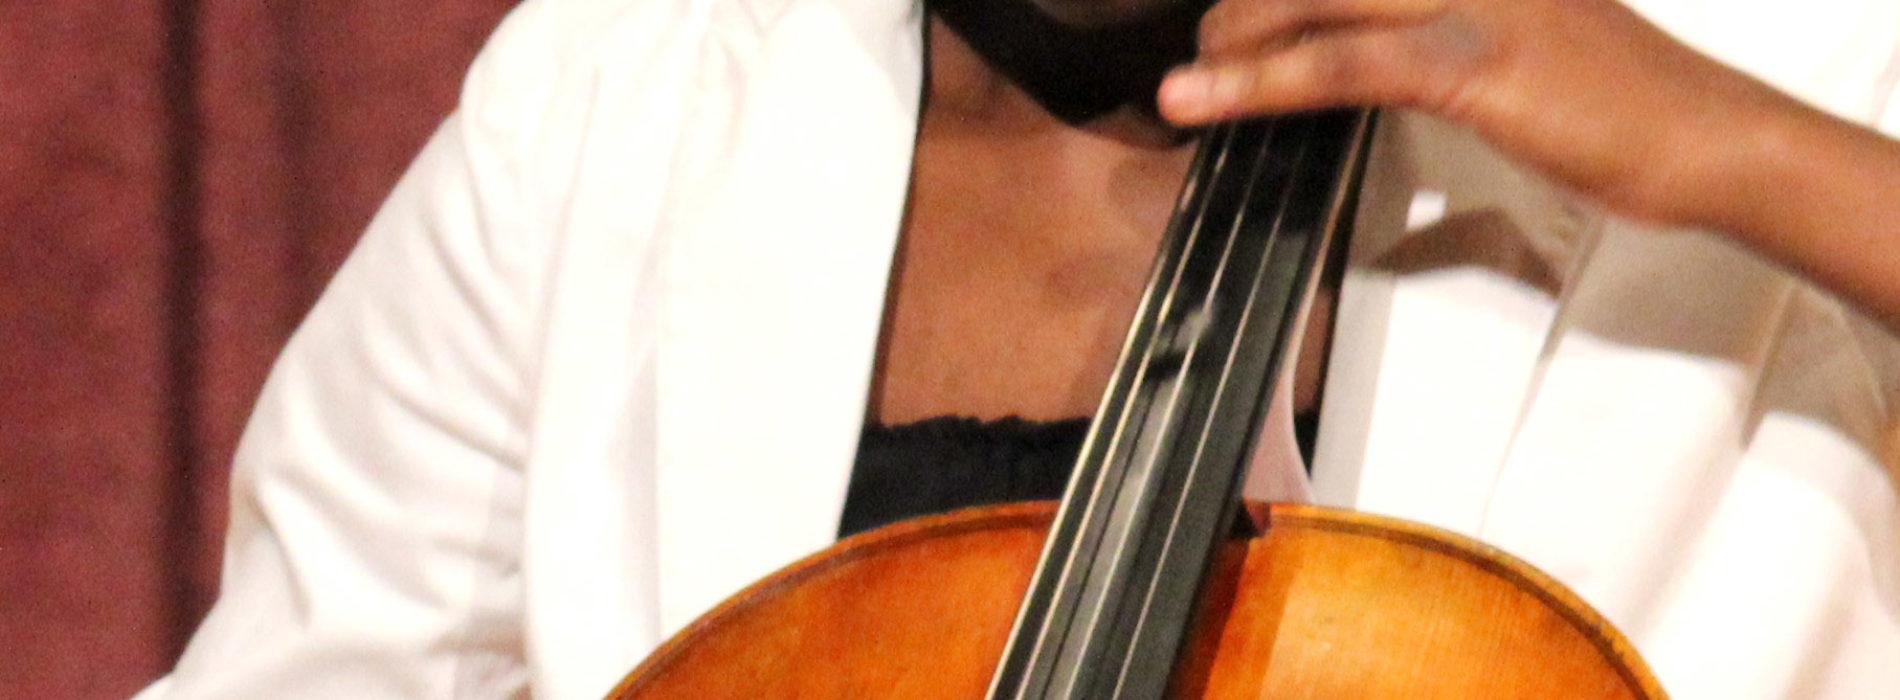 Showcase Concert Kicks Off Music Festival